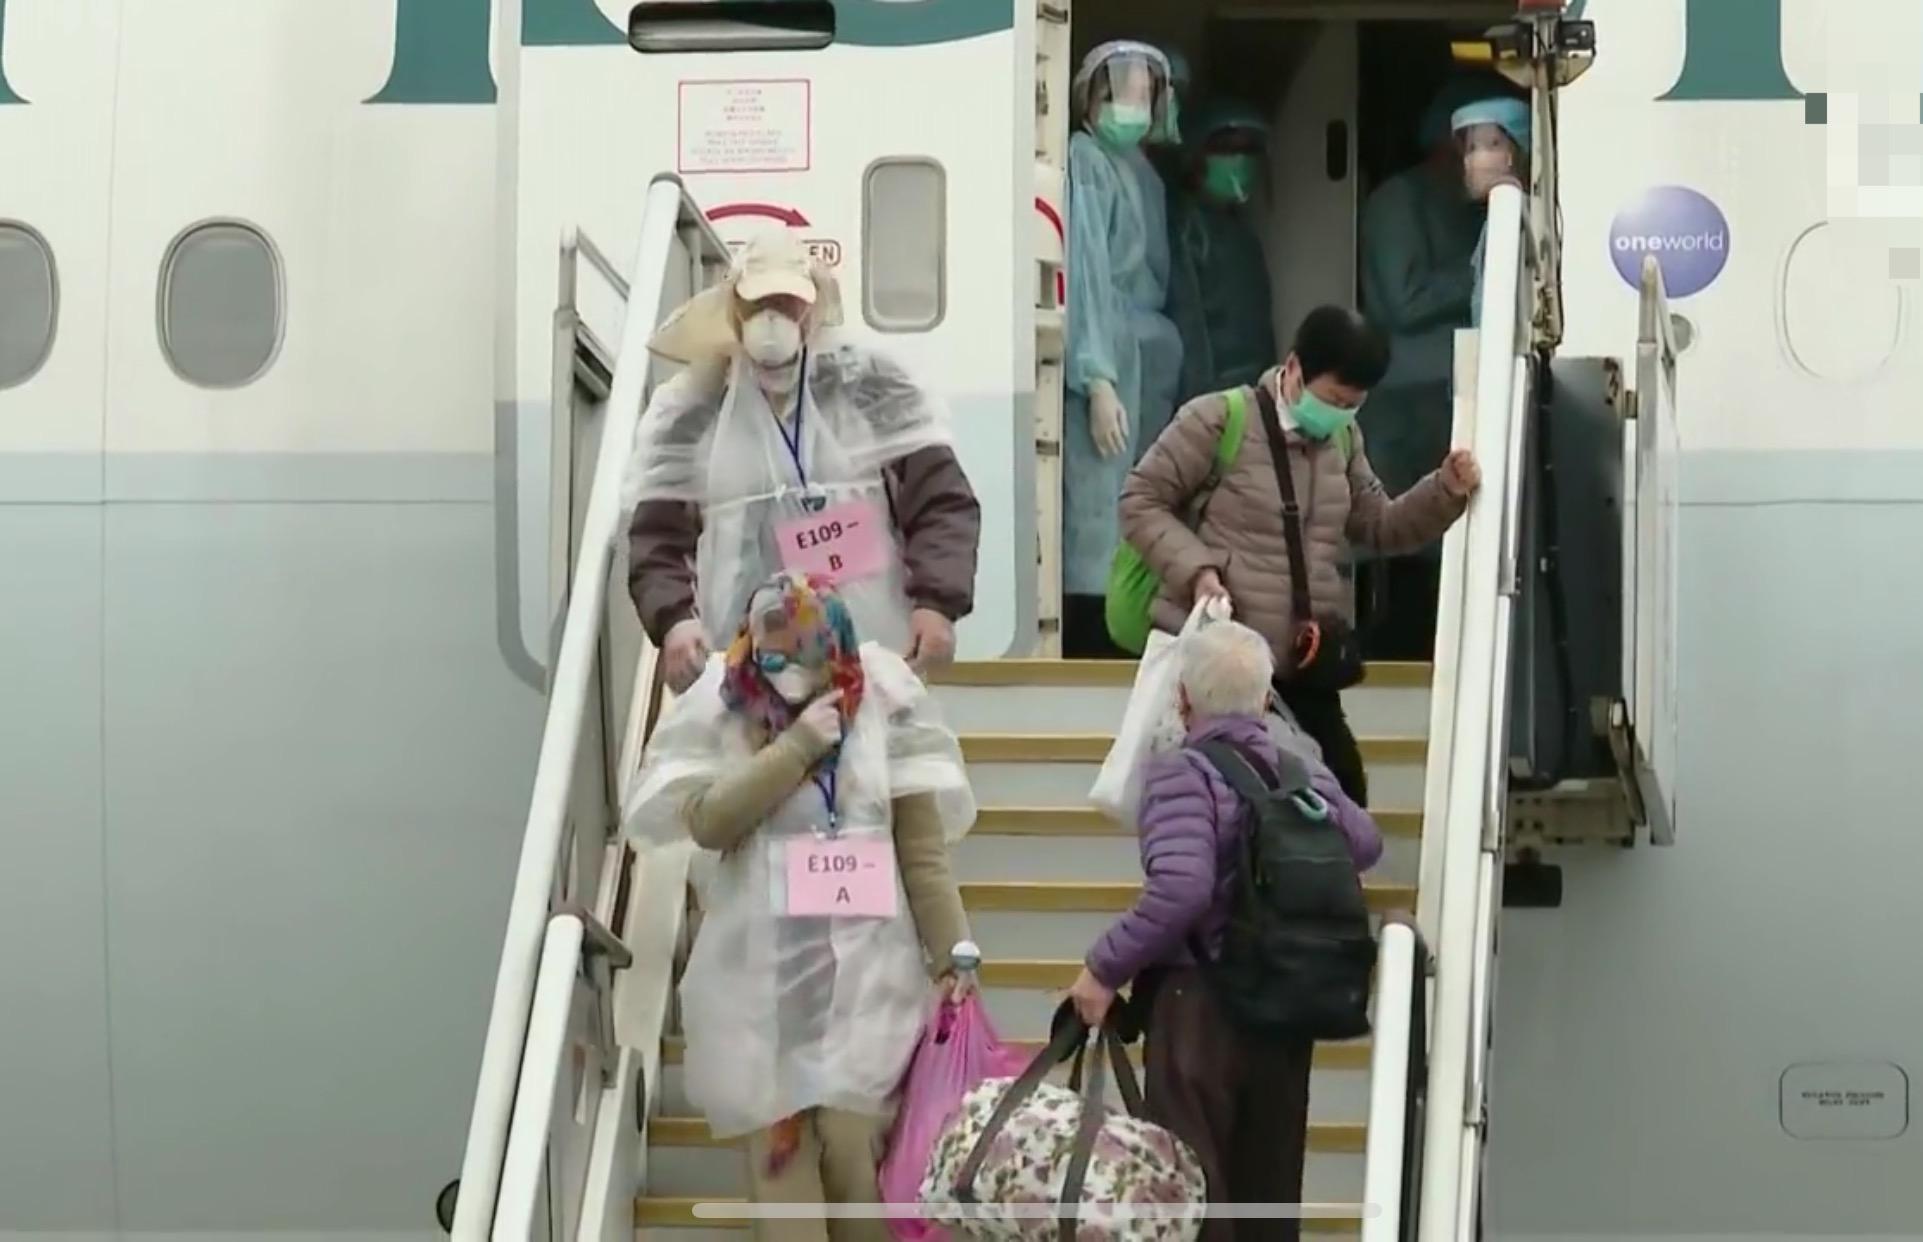 Chartered flight transports 106 residents back to Hong Kong